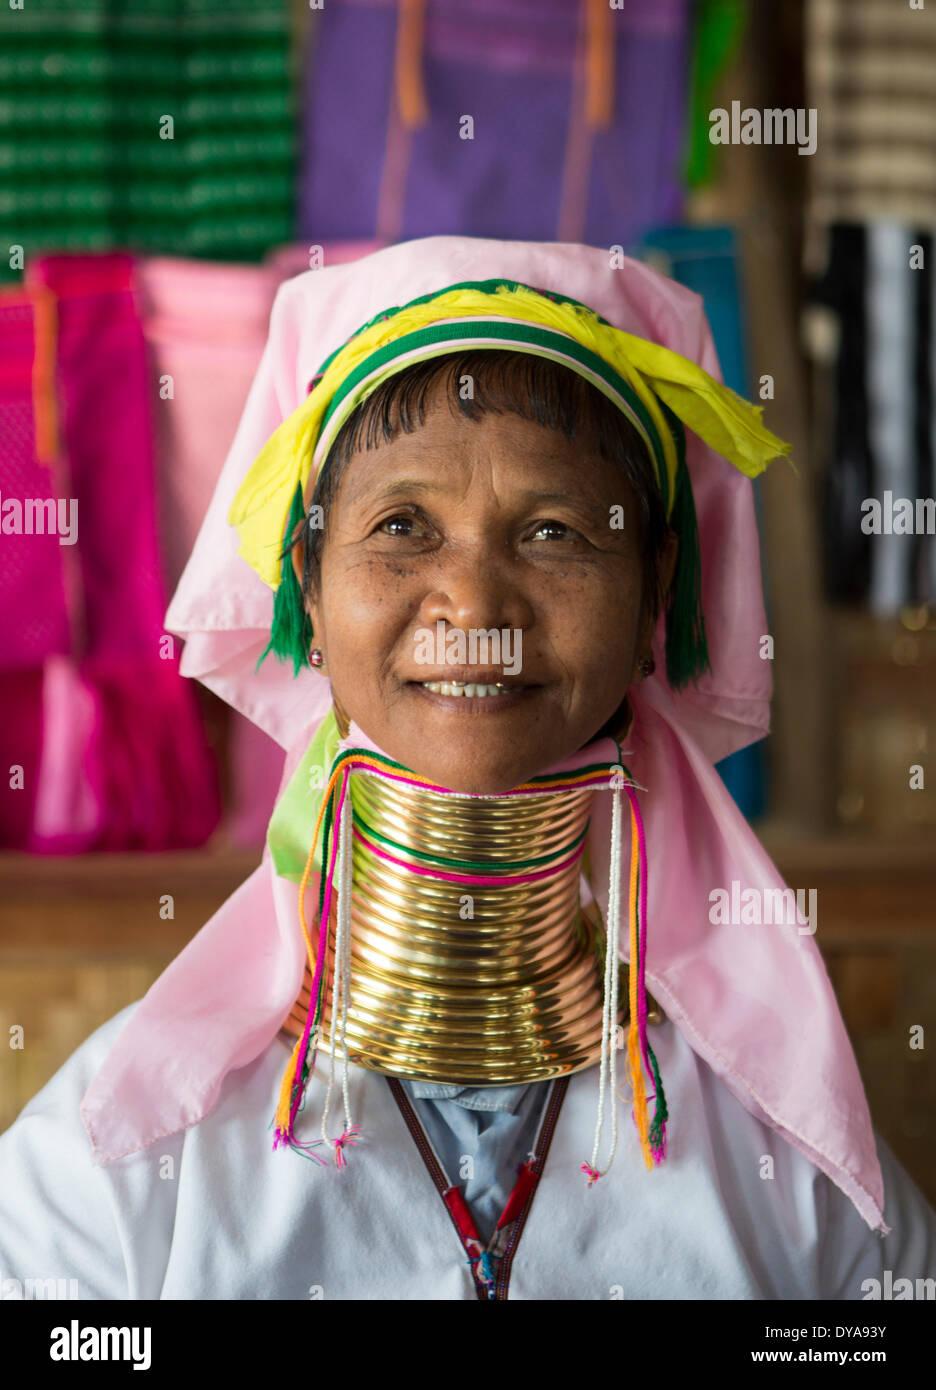 Femme girafe Asie Birmanie Myanmar Inle foi colorées attraction lake cou long voyage tradition touristique religion douloureux Photo Stock